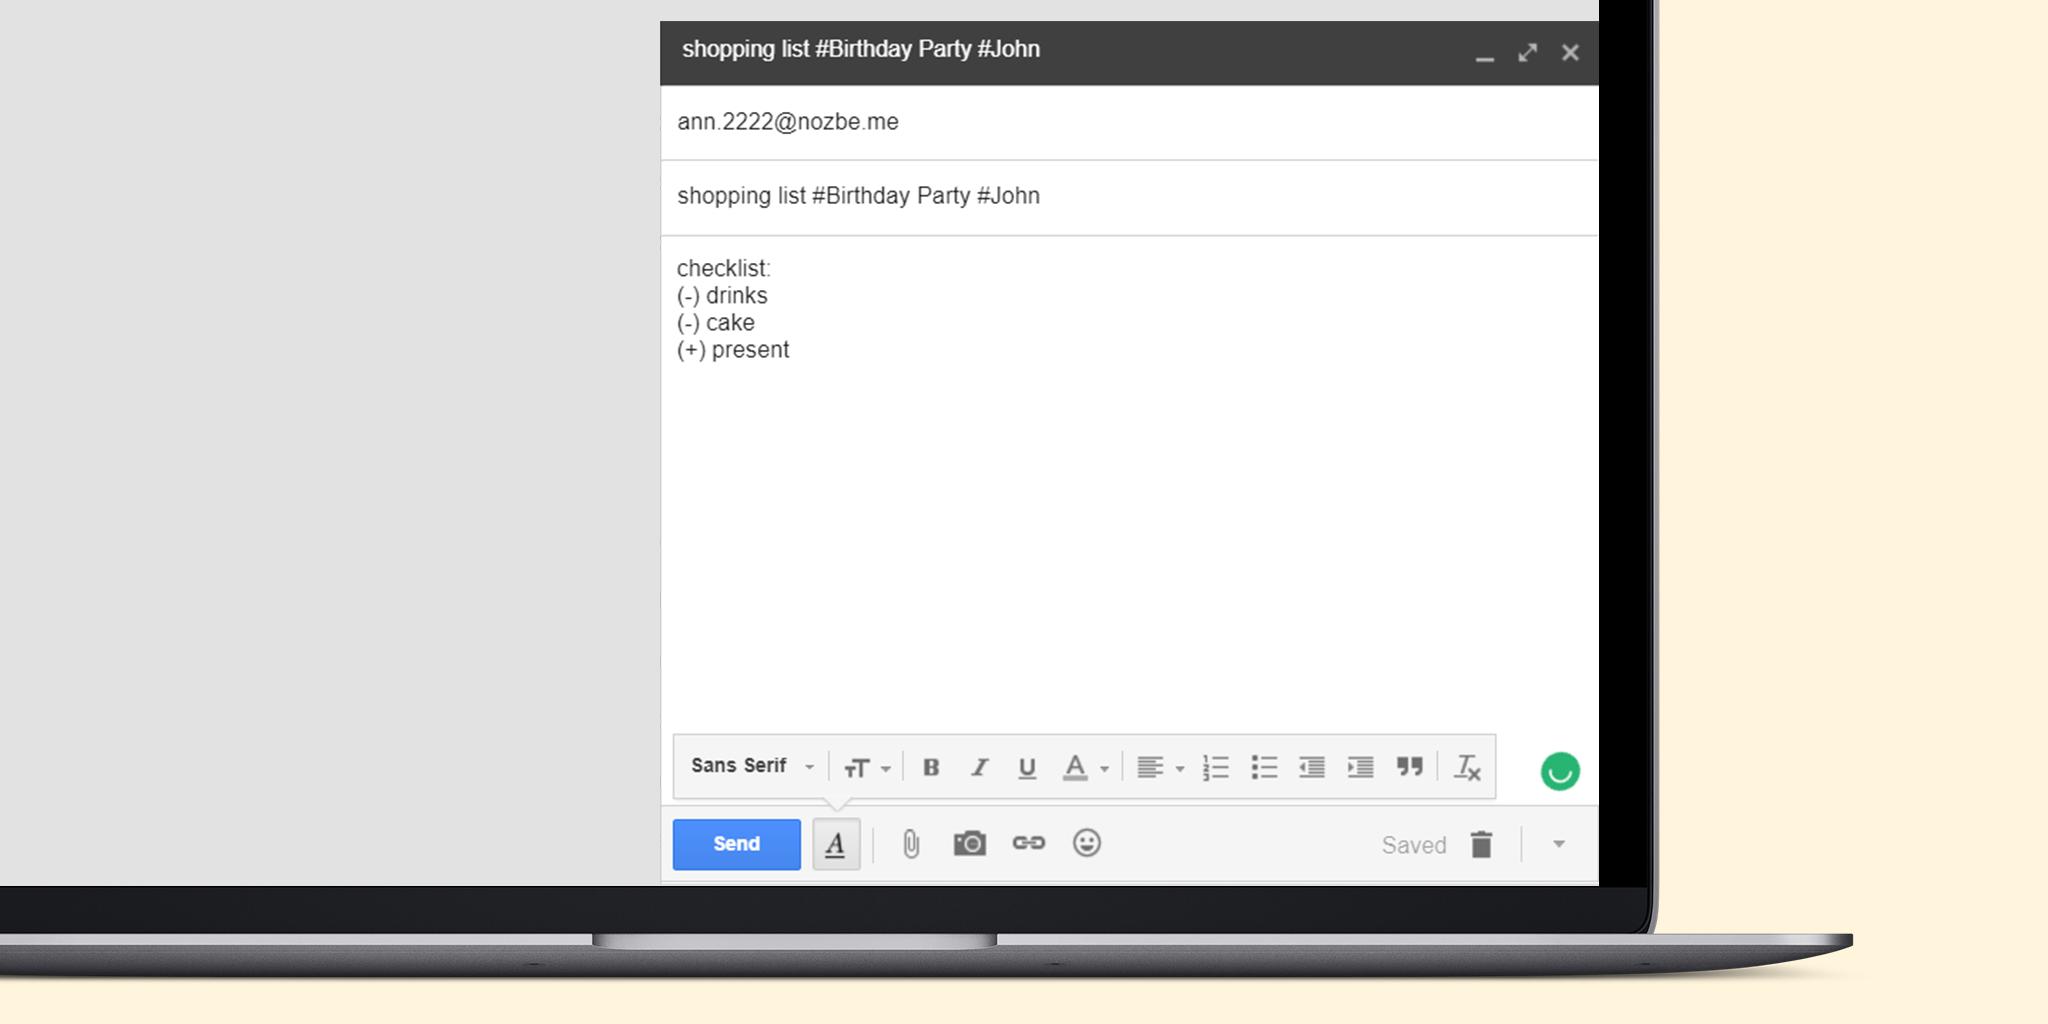 Emailing checklist